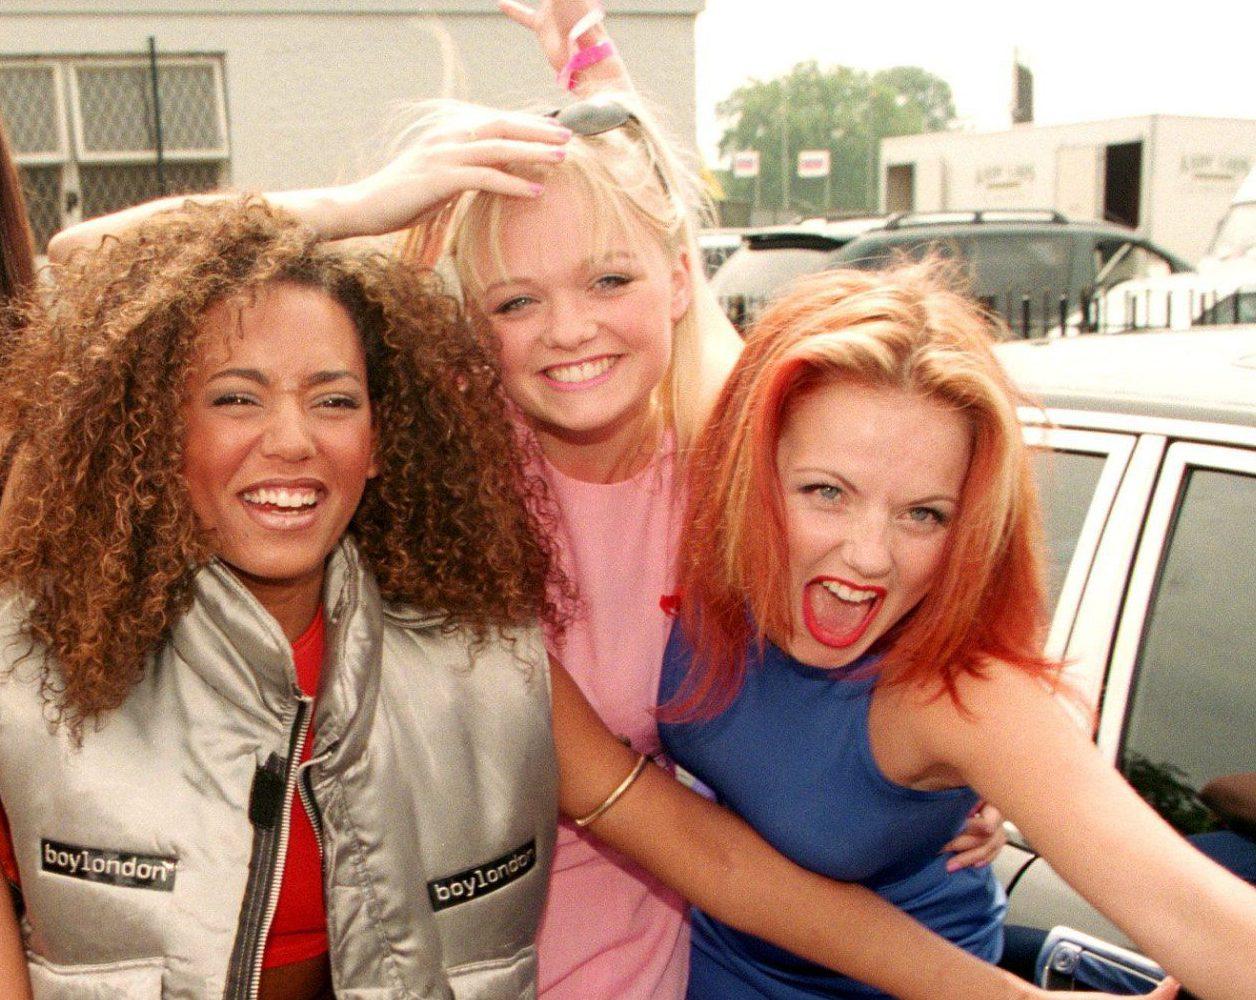 Mandatory Credit: Photo by REX/Shutterstock (261392h) The Spice Girls - Mel C, Victoria Adams, Mel B, Emma Bunton and Geri Halliwell BRIAN HARVEY OF EAST 17 - 1996